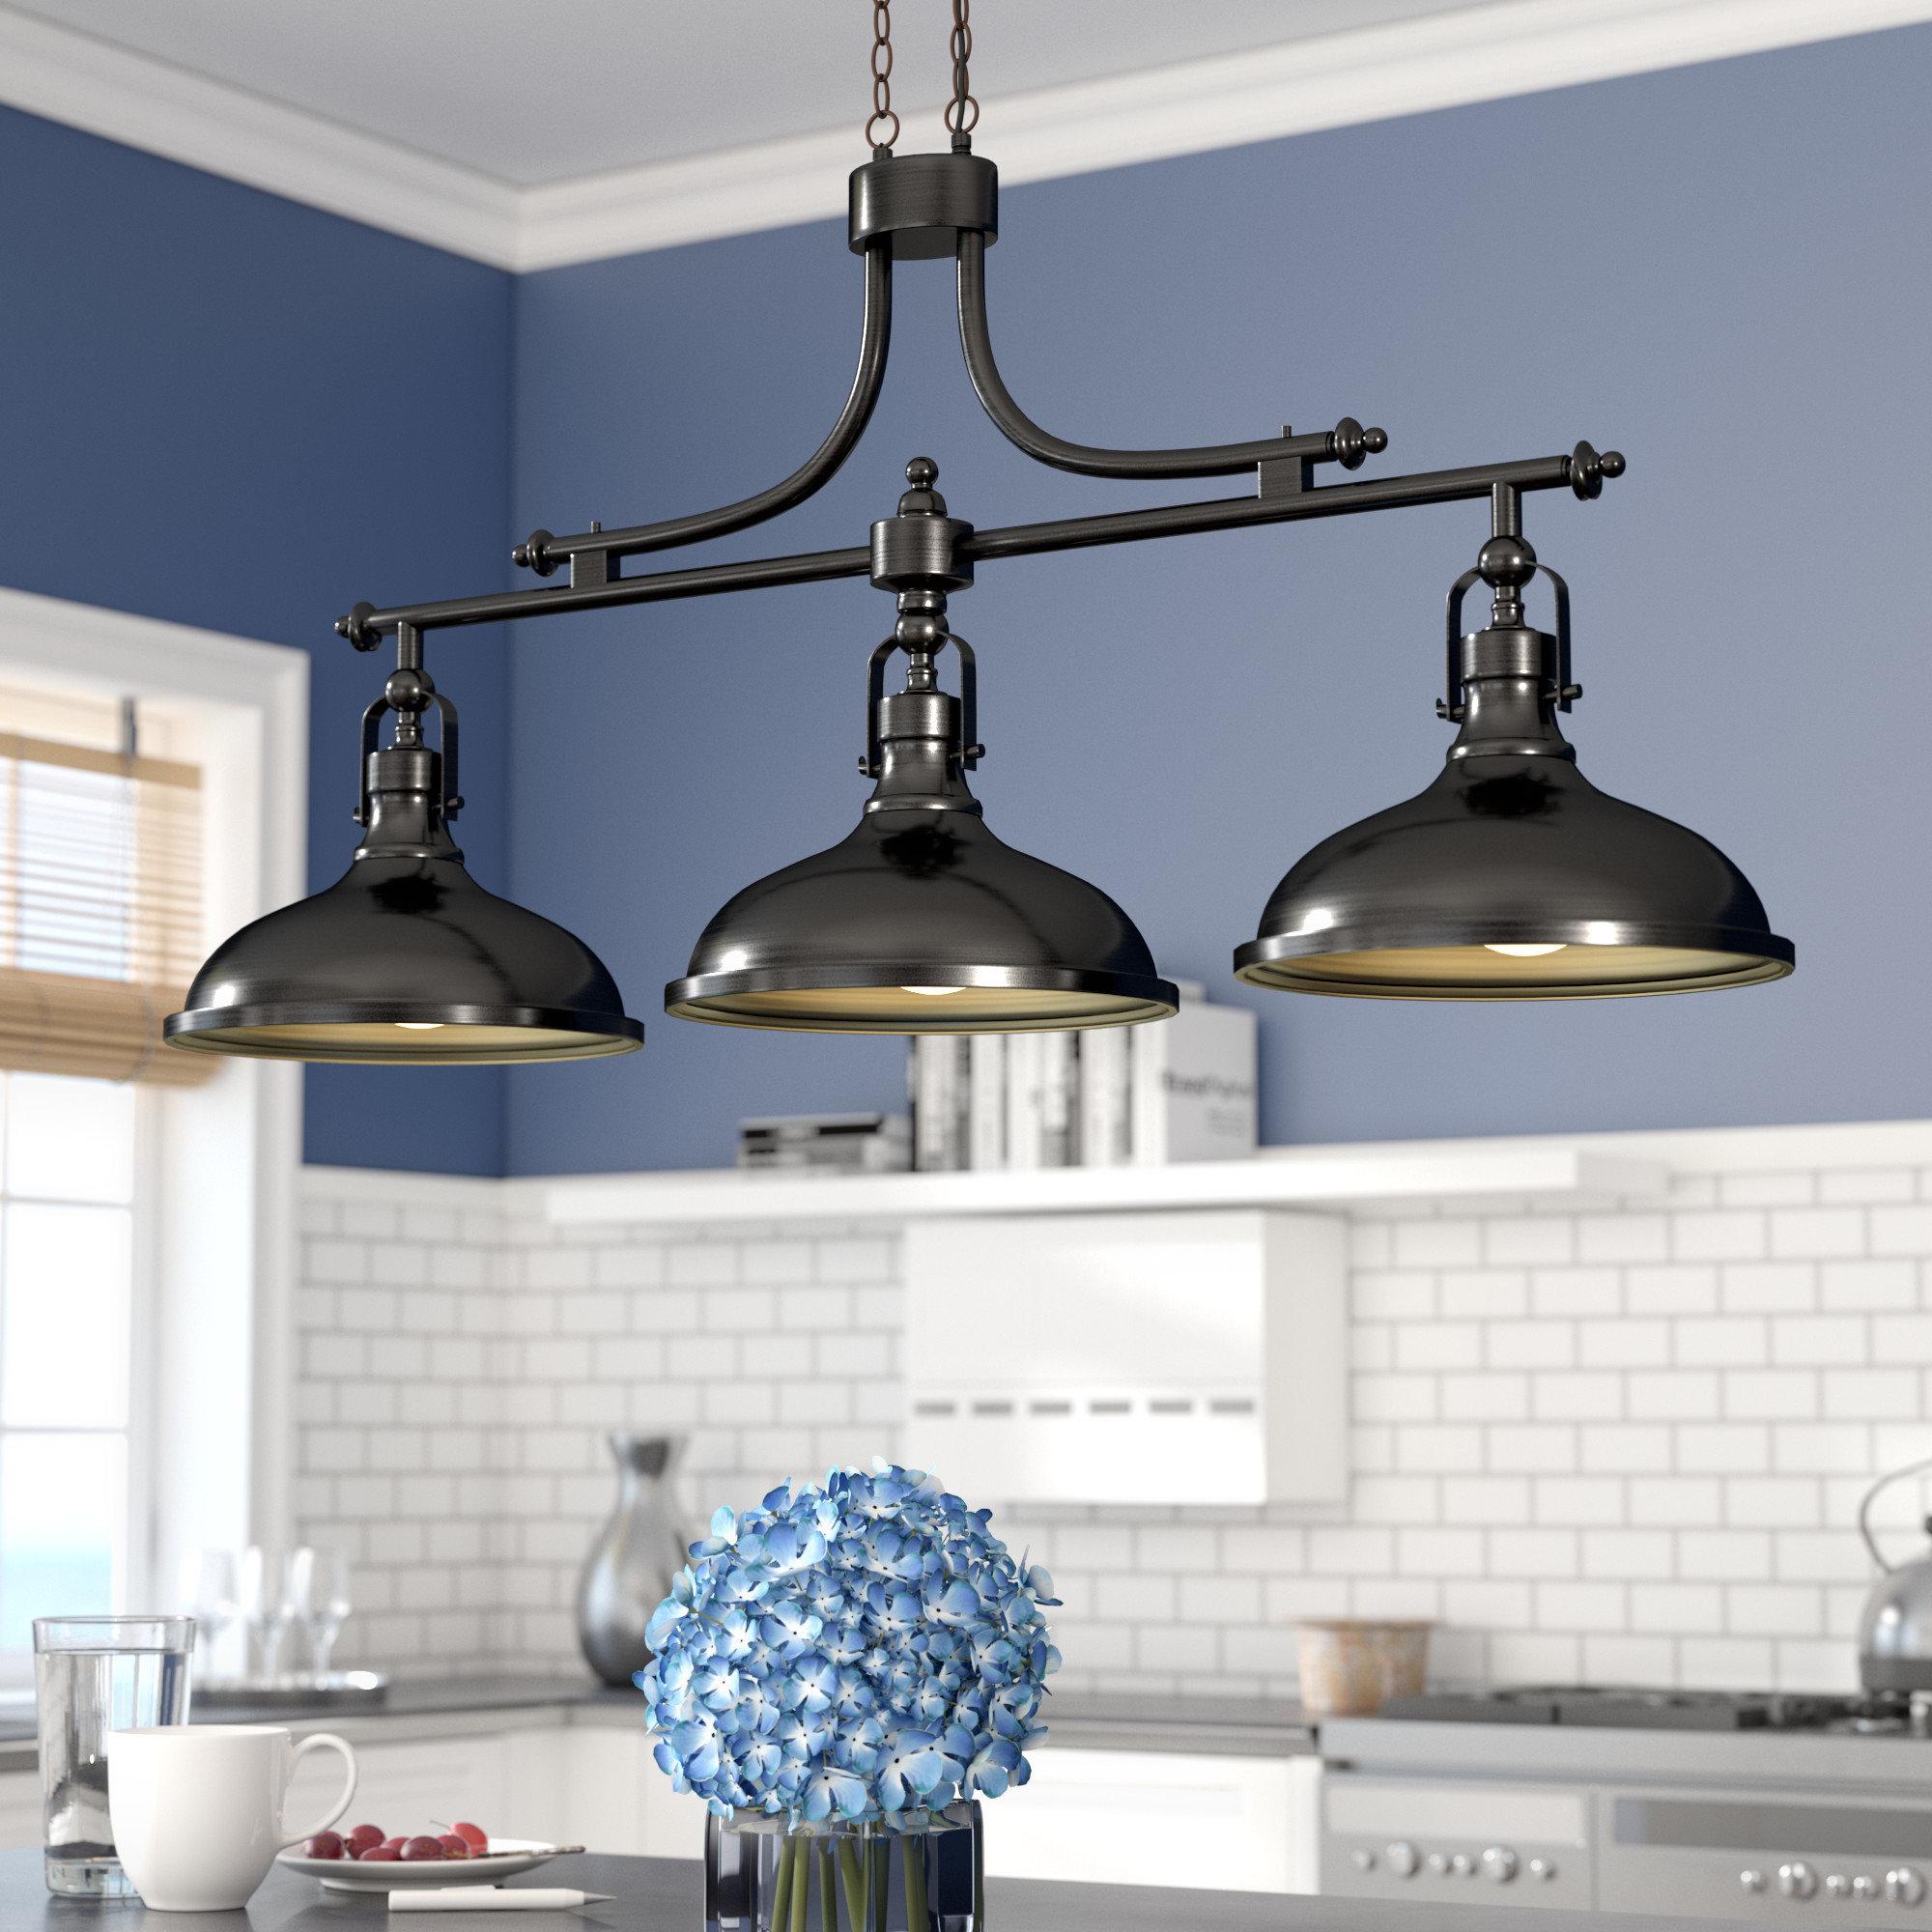 Candle Pendant Lights | Wayfair Throughout Euclid 2 Light Kitchen Island Linear Pendants (View 17 of 30)